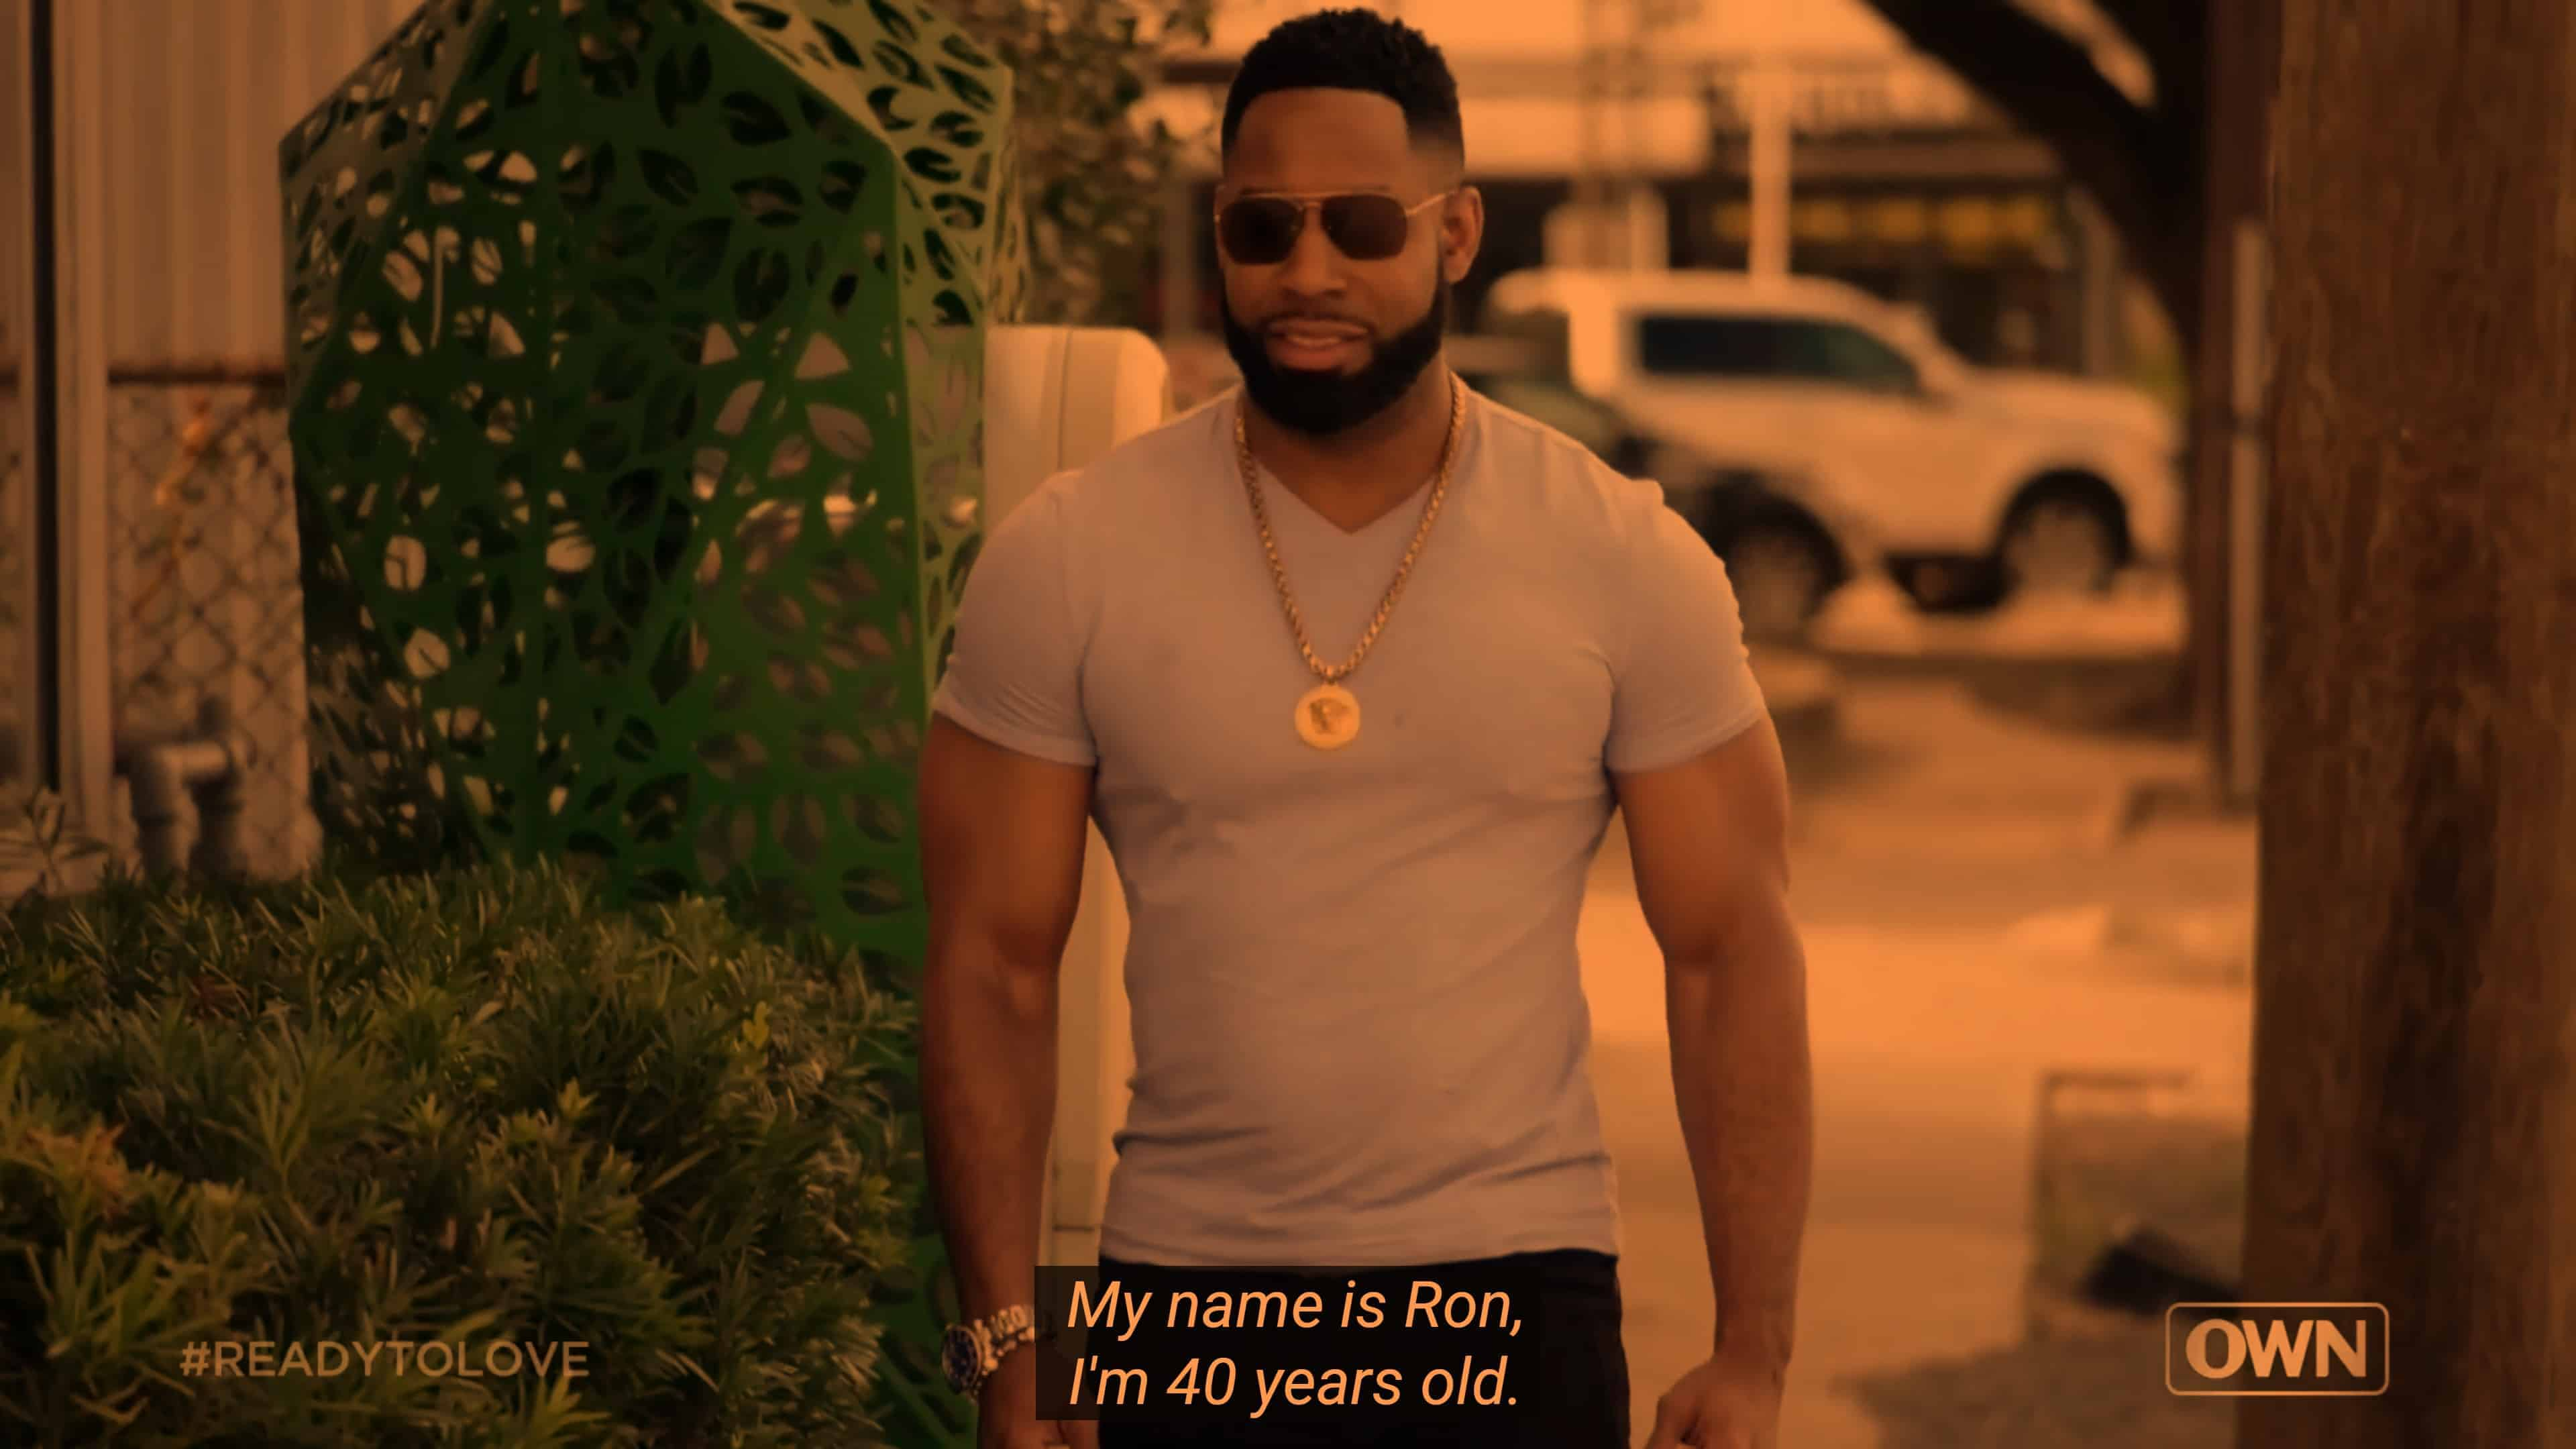 Ron introducing himself